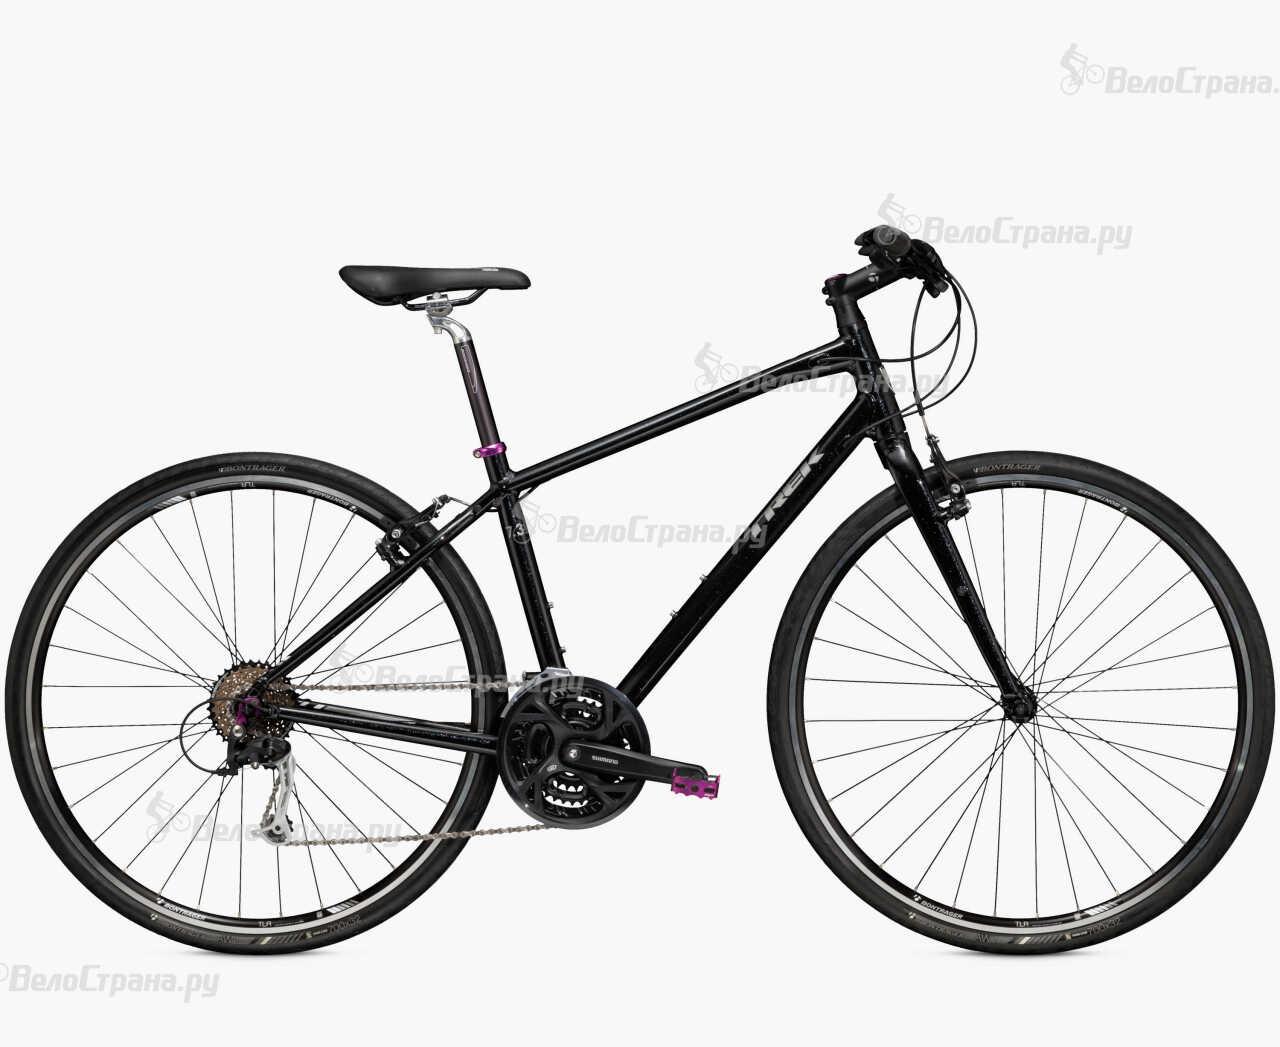 Велосипед Trek 7.3 FX WSD (2016) велосипед trek madone 3 1 wsd 2013